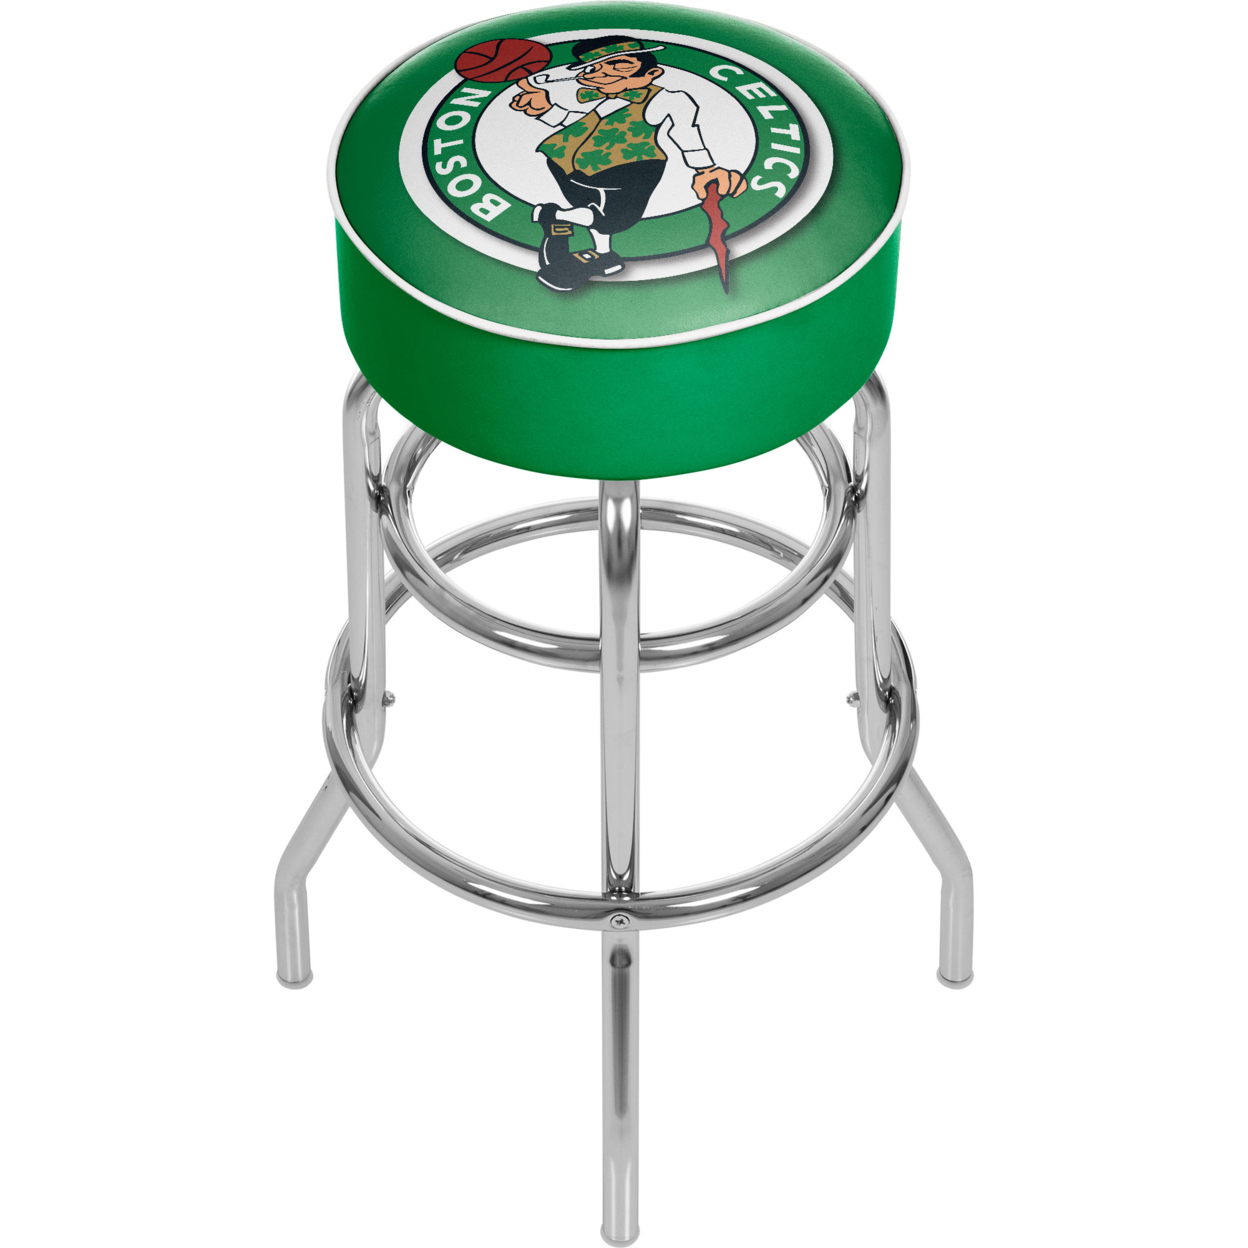 Boston Celtics NBA Padded Swivel Bar Stool 30 Inches High мотоблок дизельный patriot boston 9de